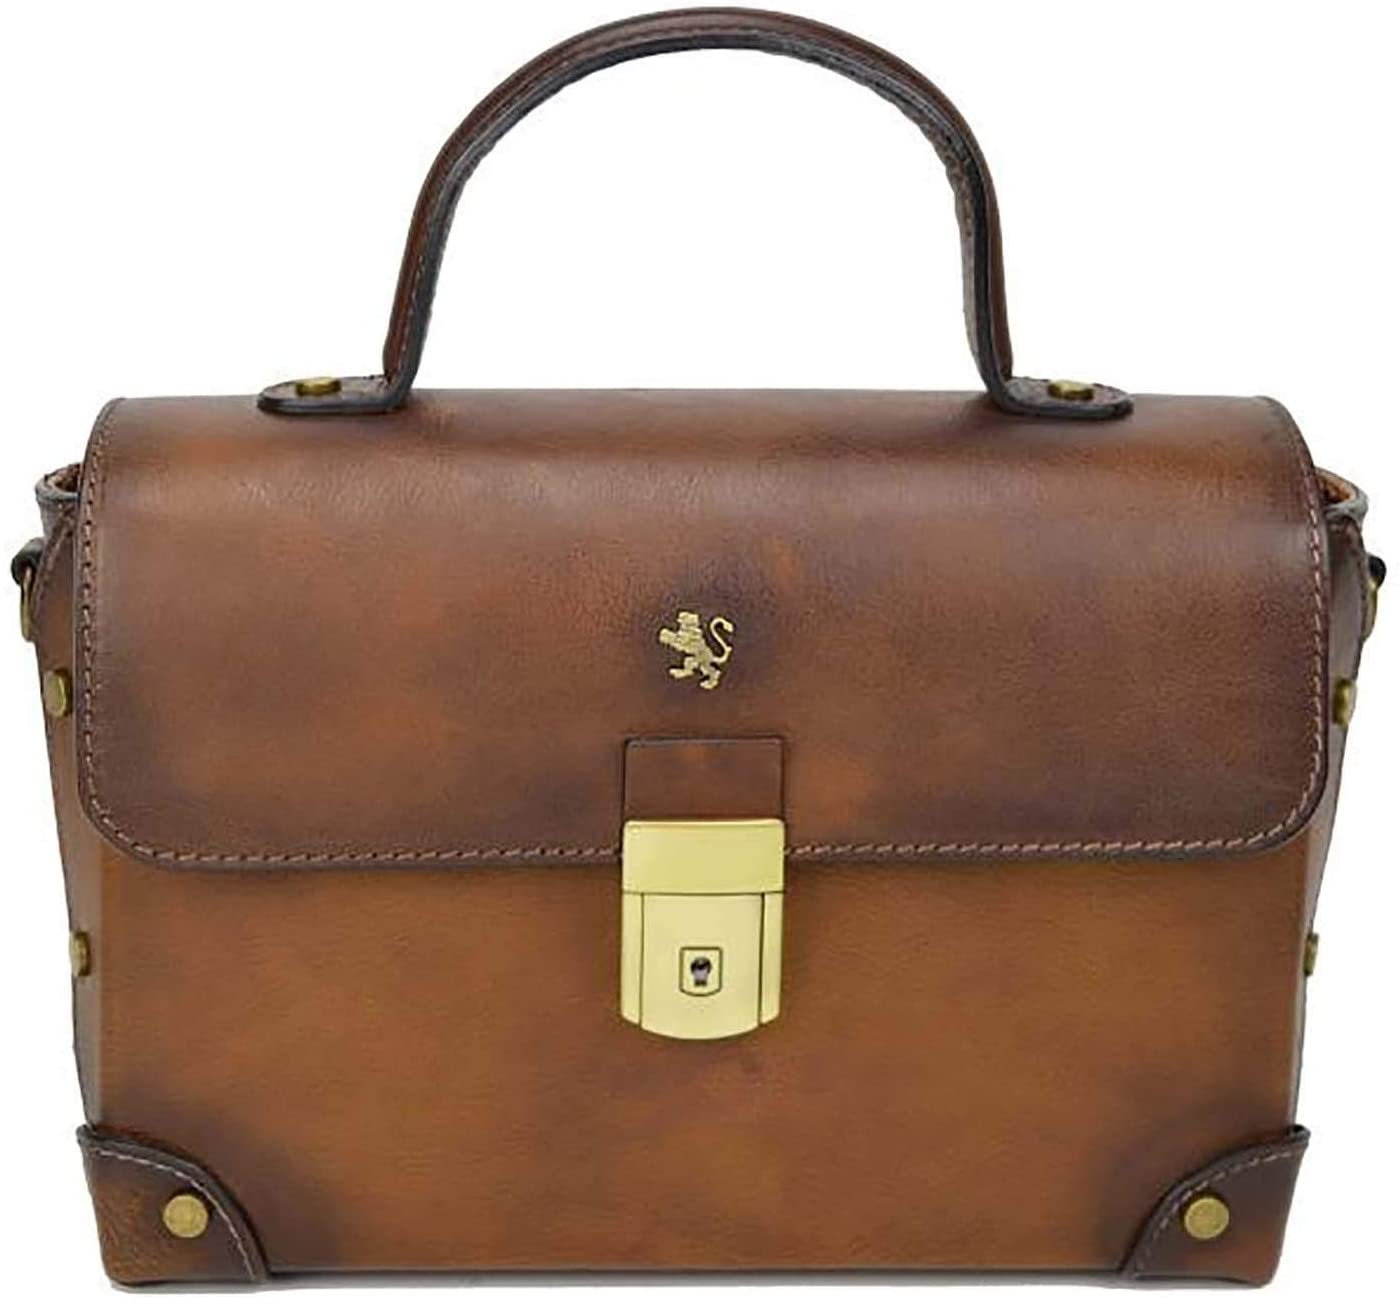 Pratesi Buti lady bag - B330 Bruce (Brown)